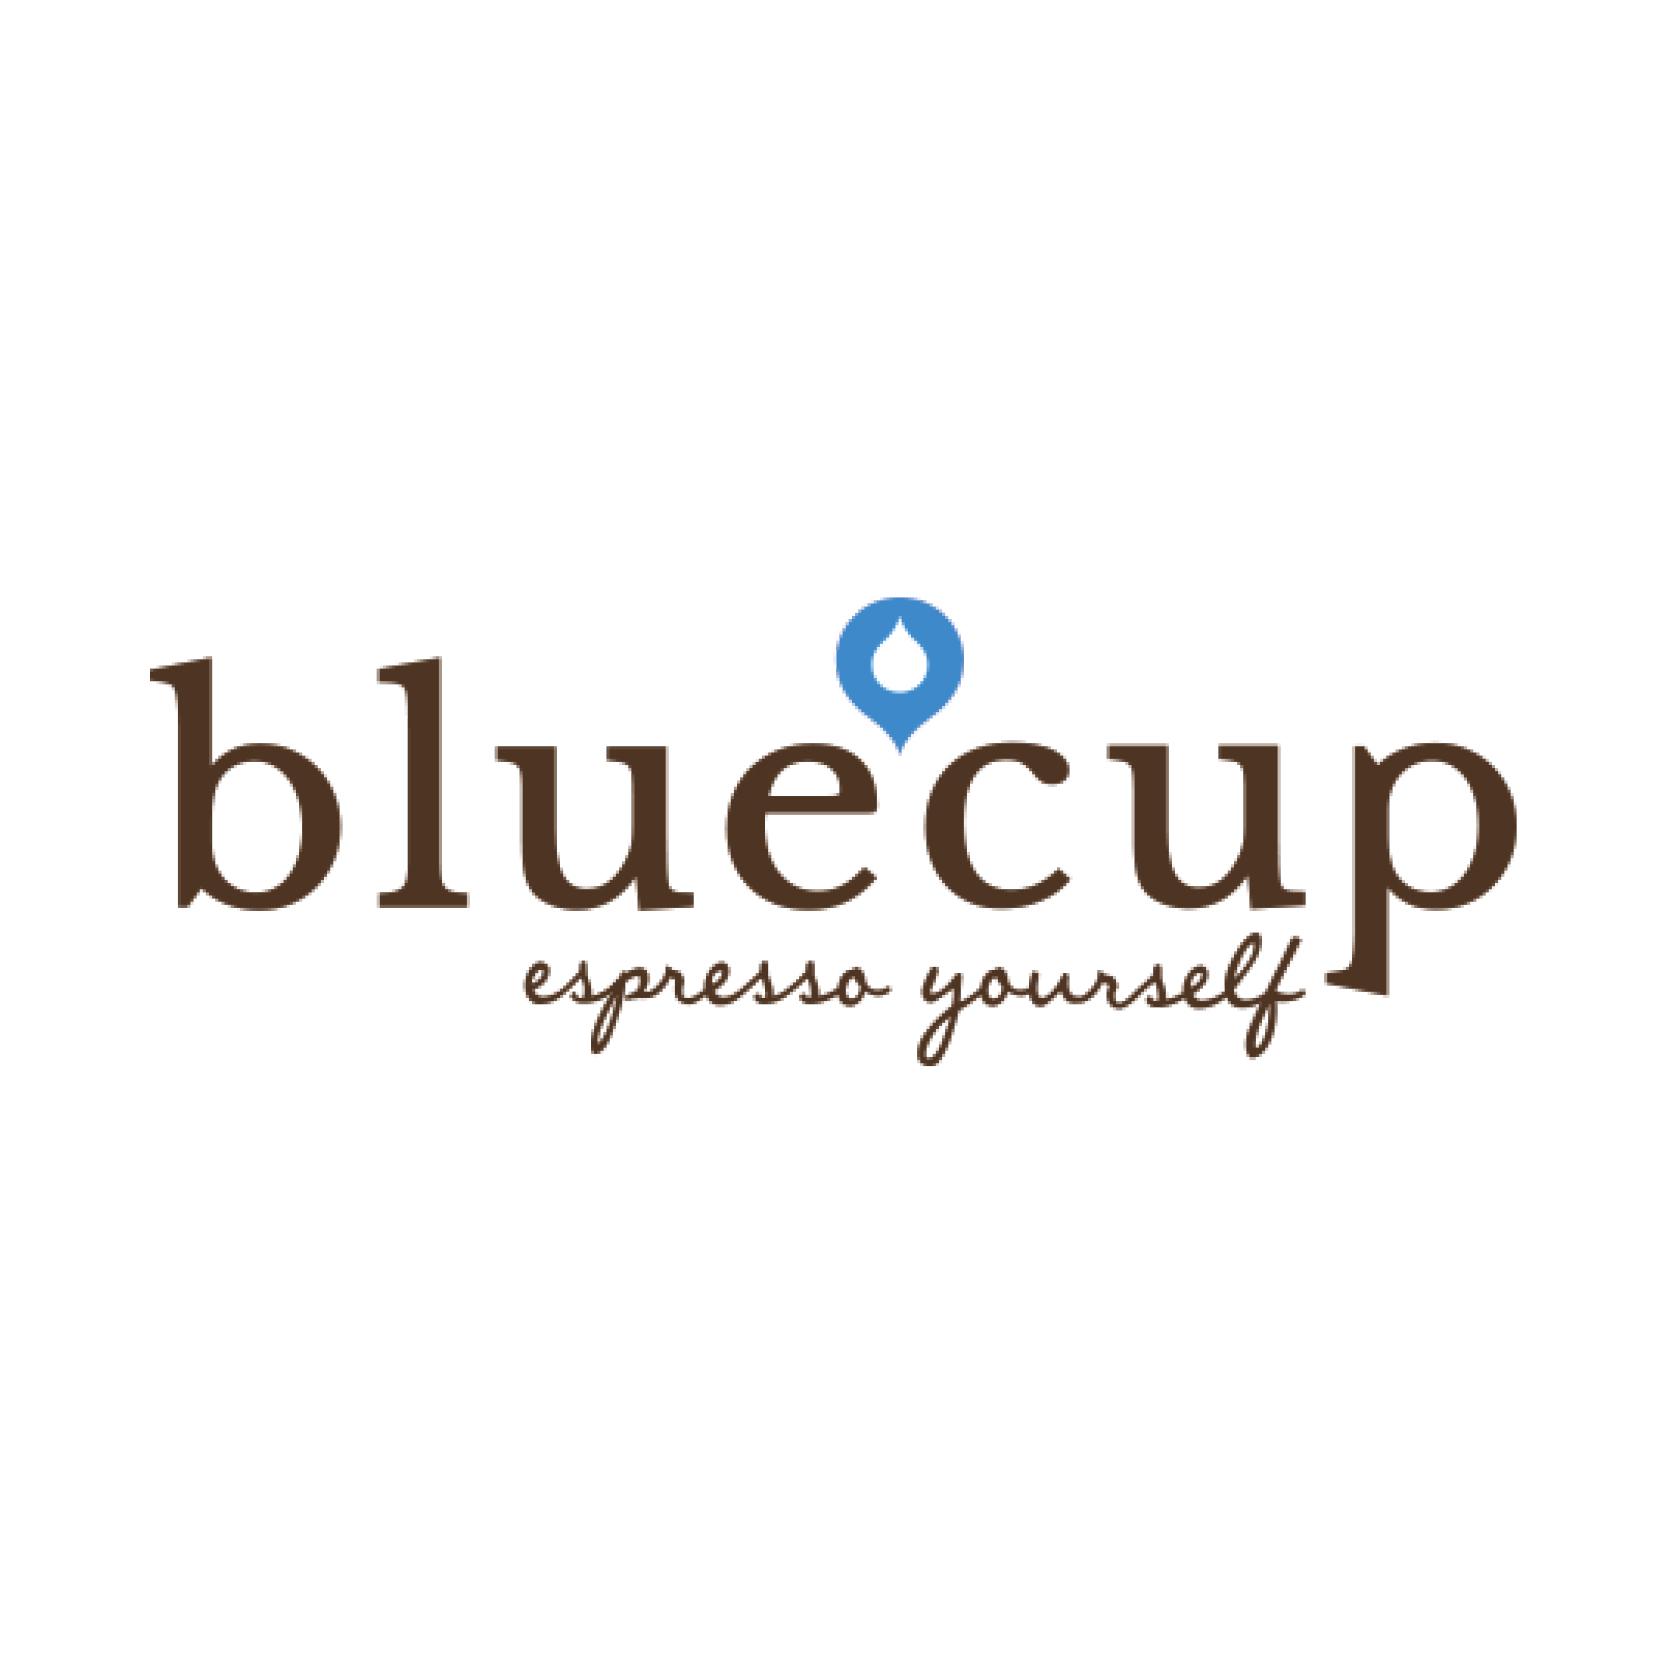 Bluecup